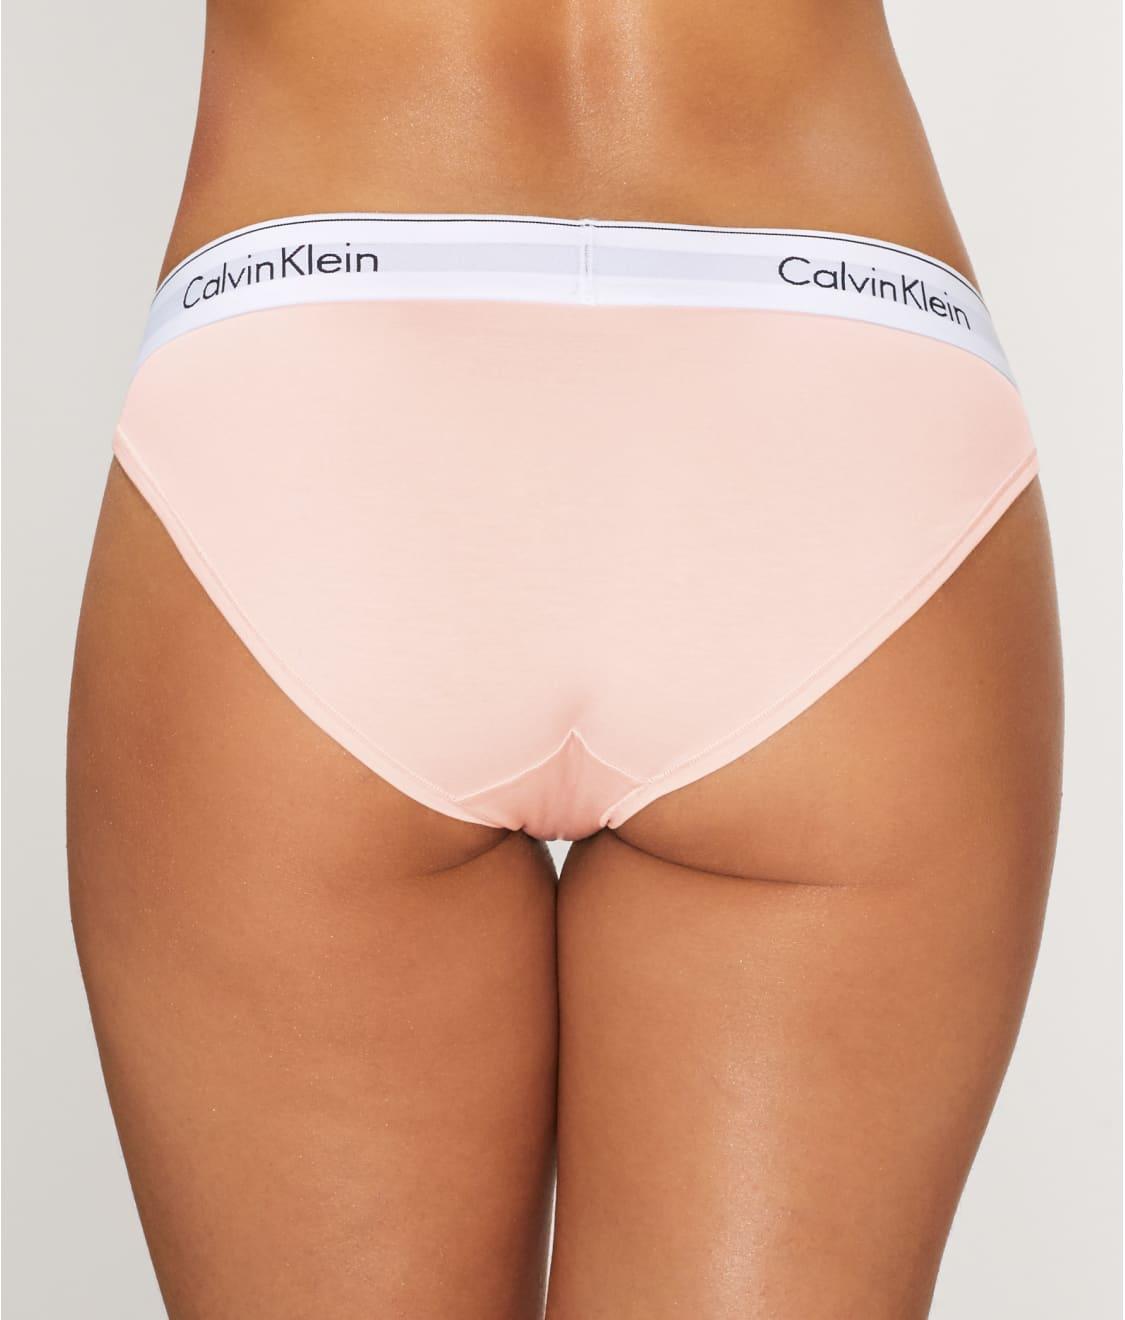 679c20fe9b See Modern Cotton Bikini in Nymphs Thigh